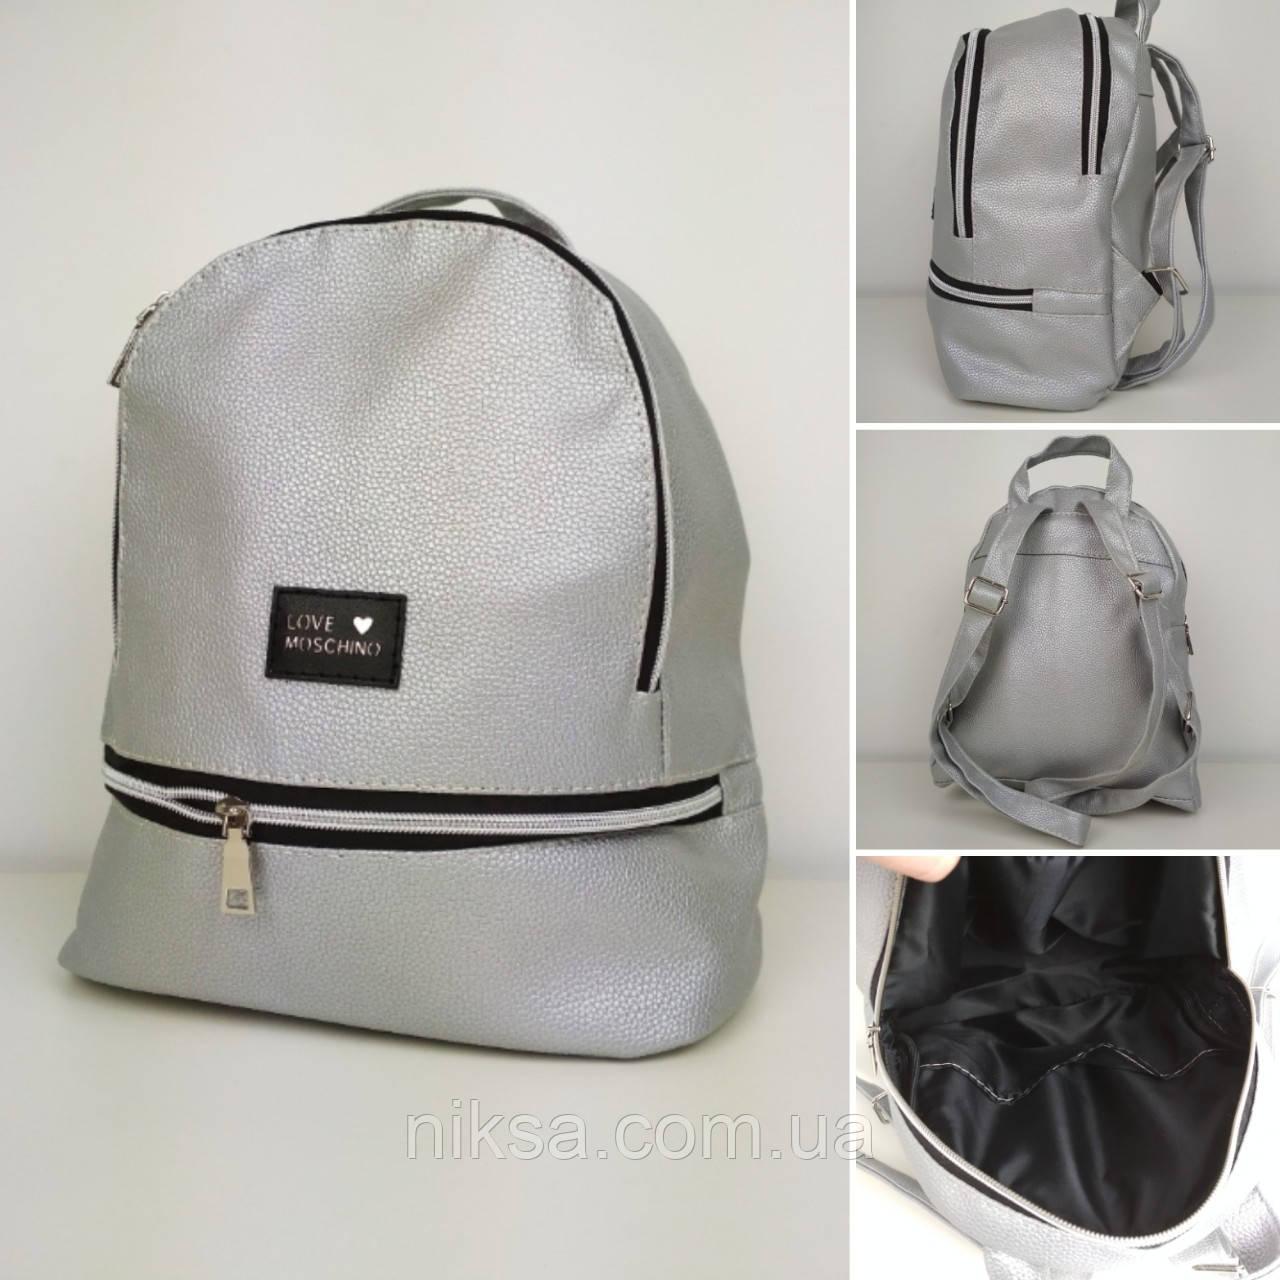 Рюкзак городской Chanel love moschino размер 30x25x15cm